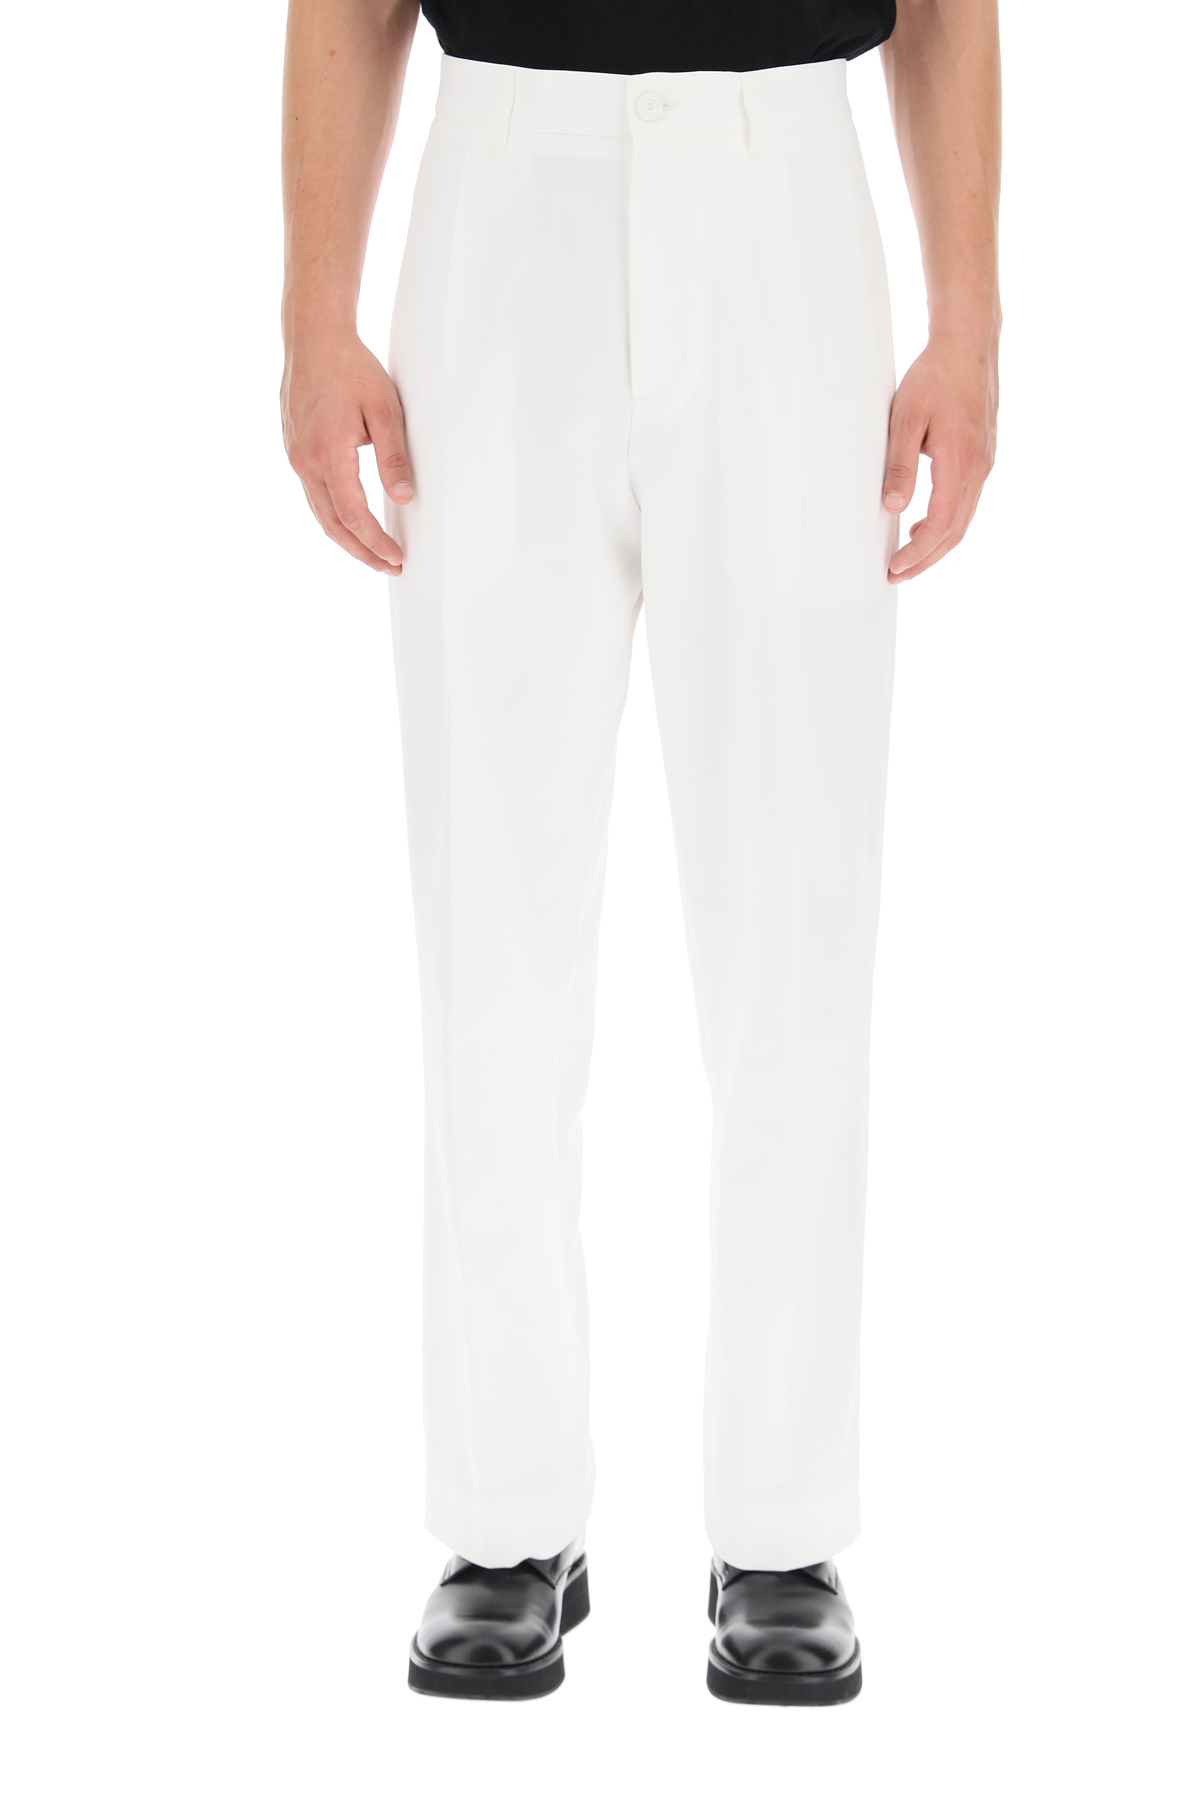 Dior pantaloni chino cropped